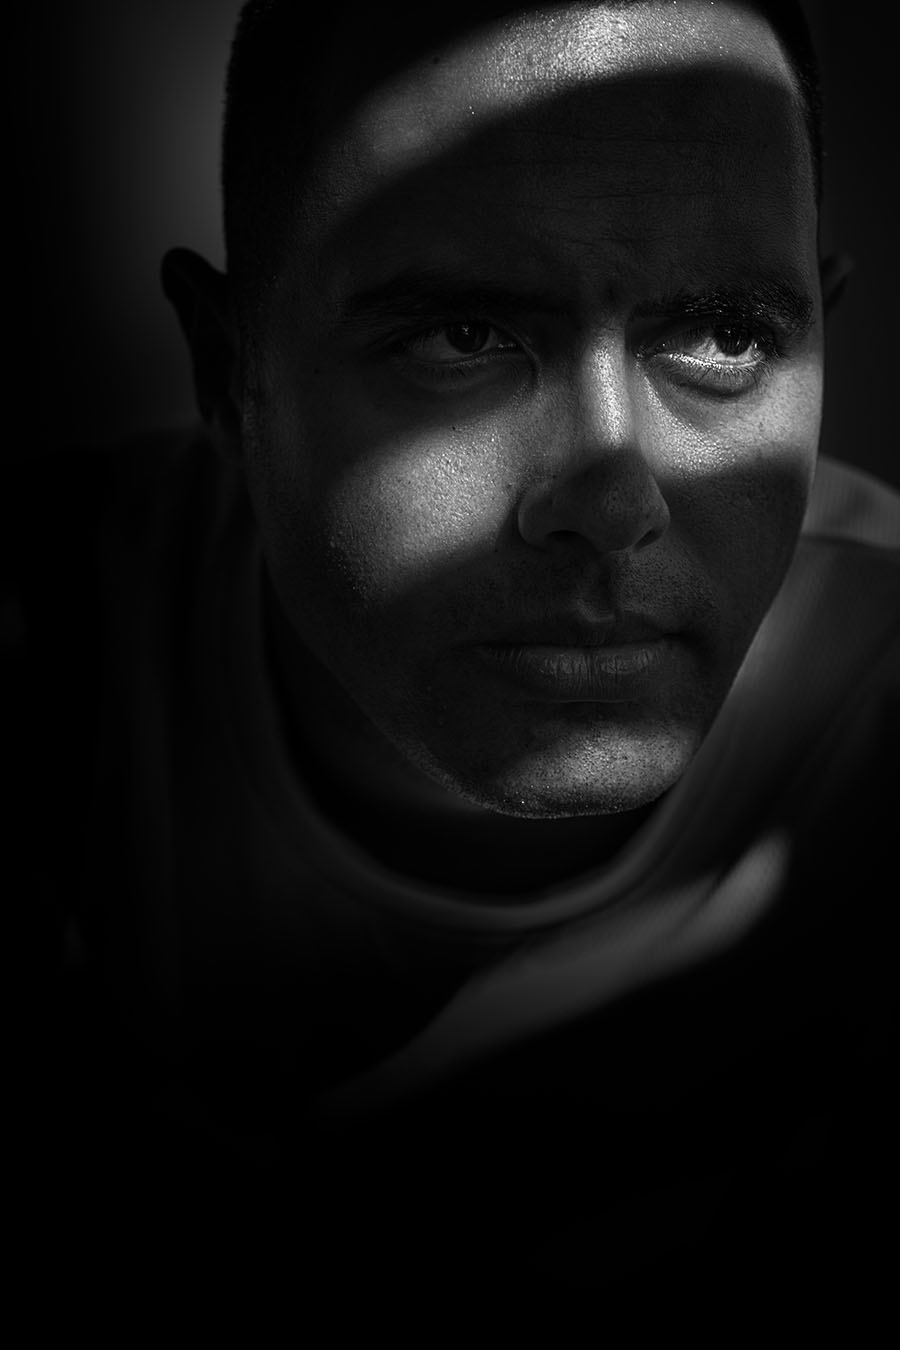 Portrait of Eremasi using light filtering through louvre blades